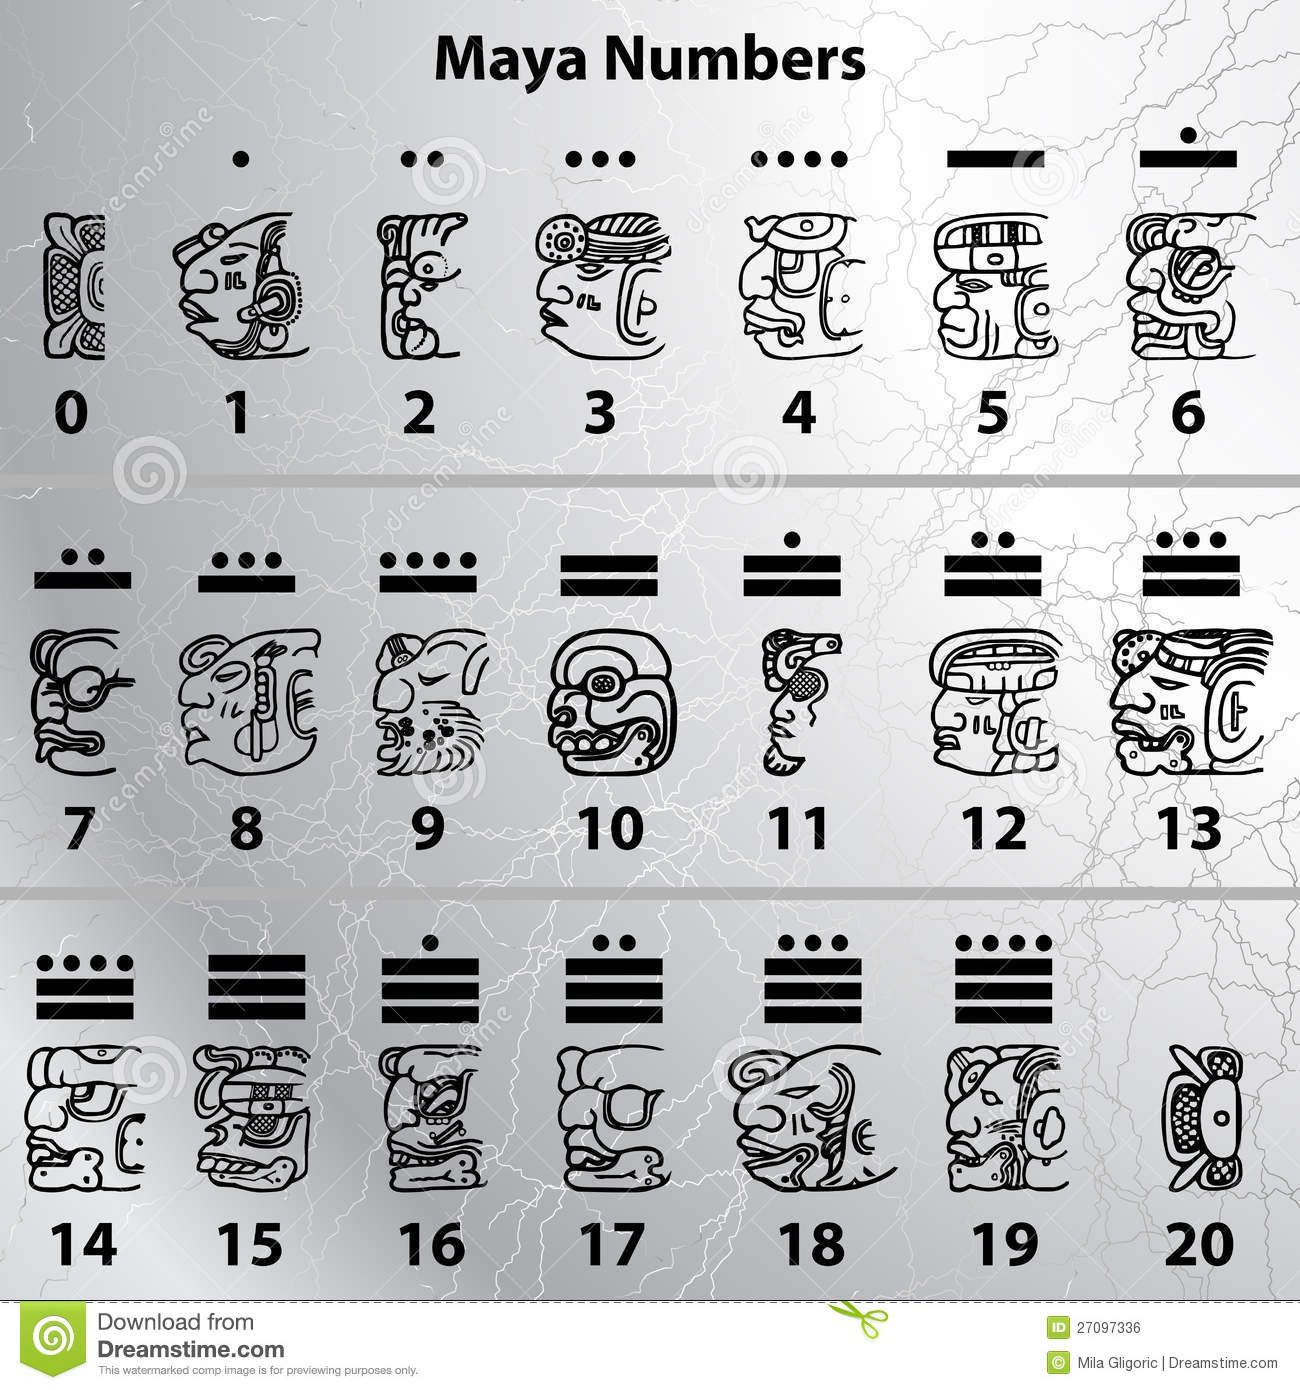 Mayan glyphs alphabet mayan alphabet maya numbers symbol history mayan glyphs alphabet mayan alphabet maya numbers symbol history biocorpaavc